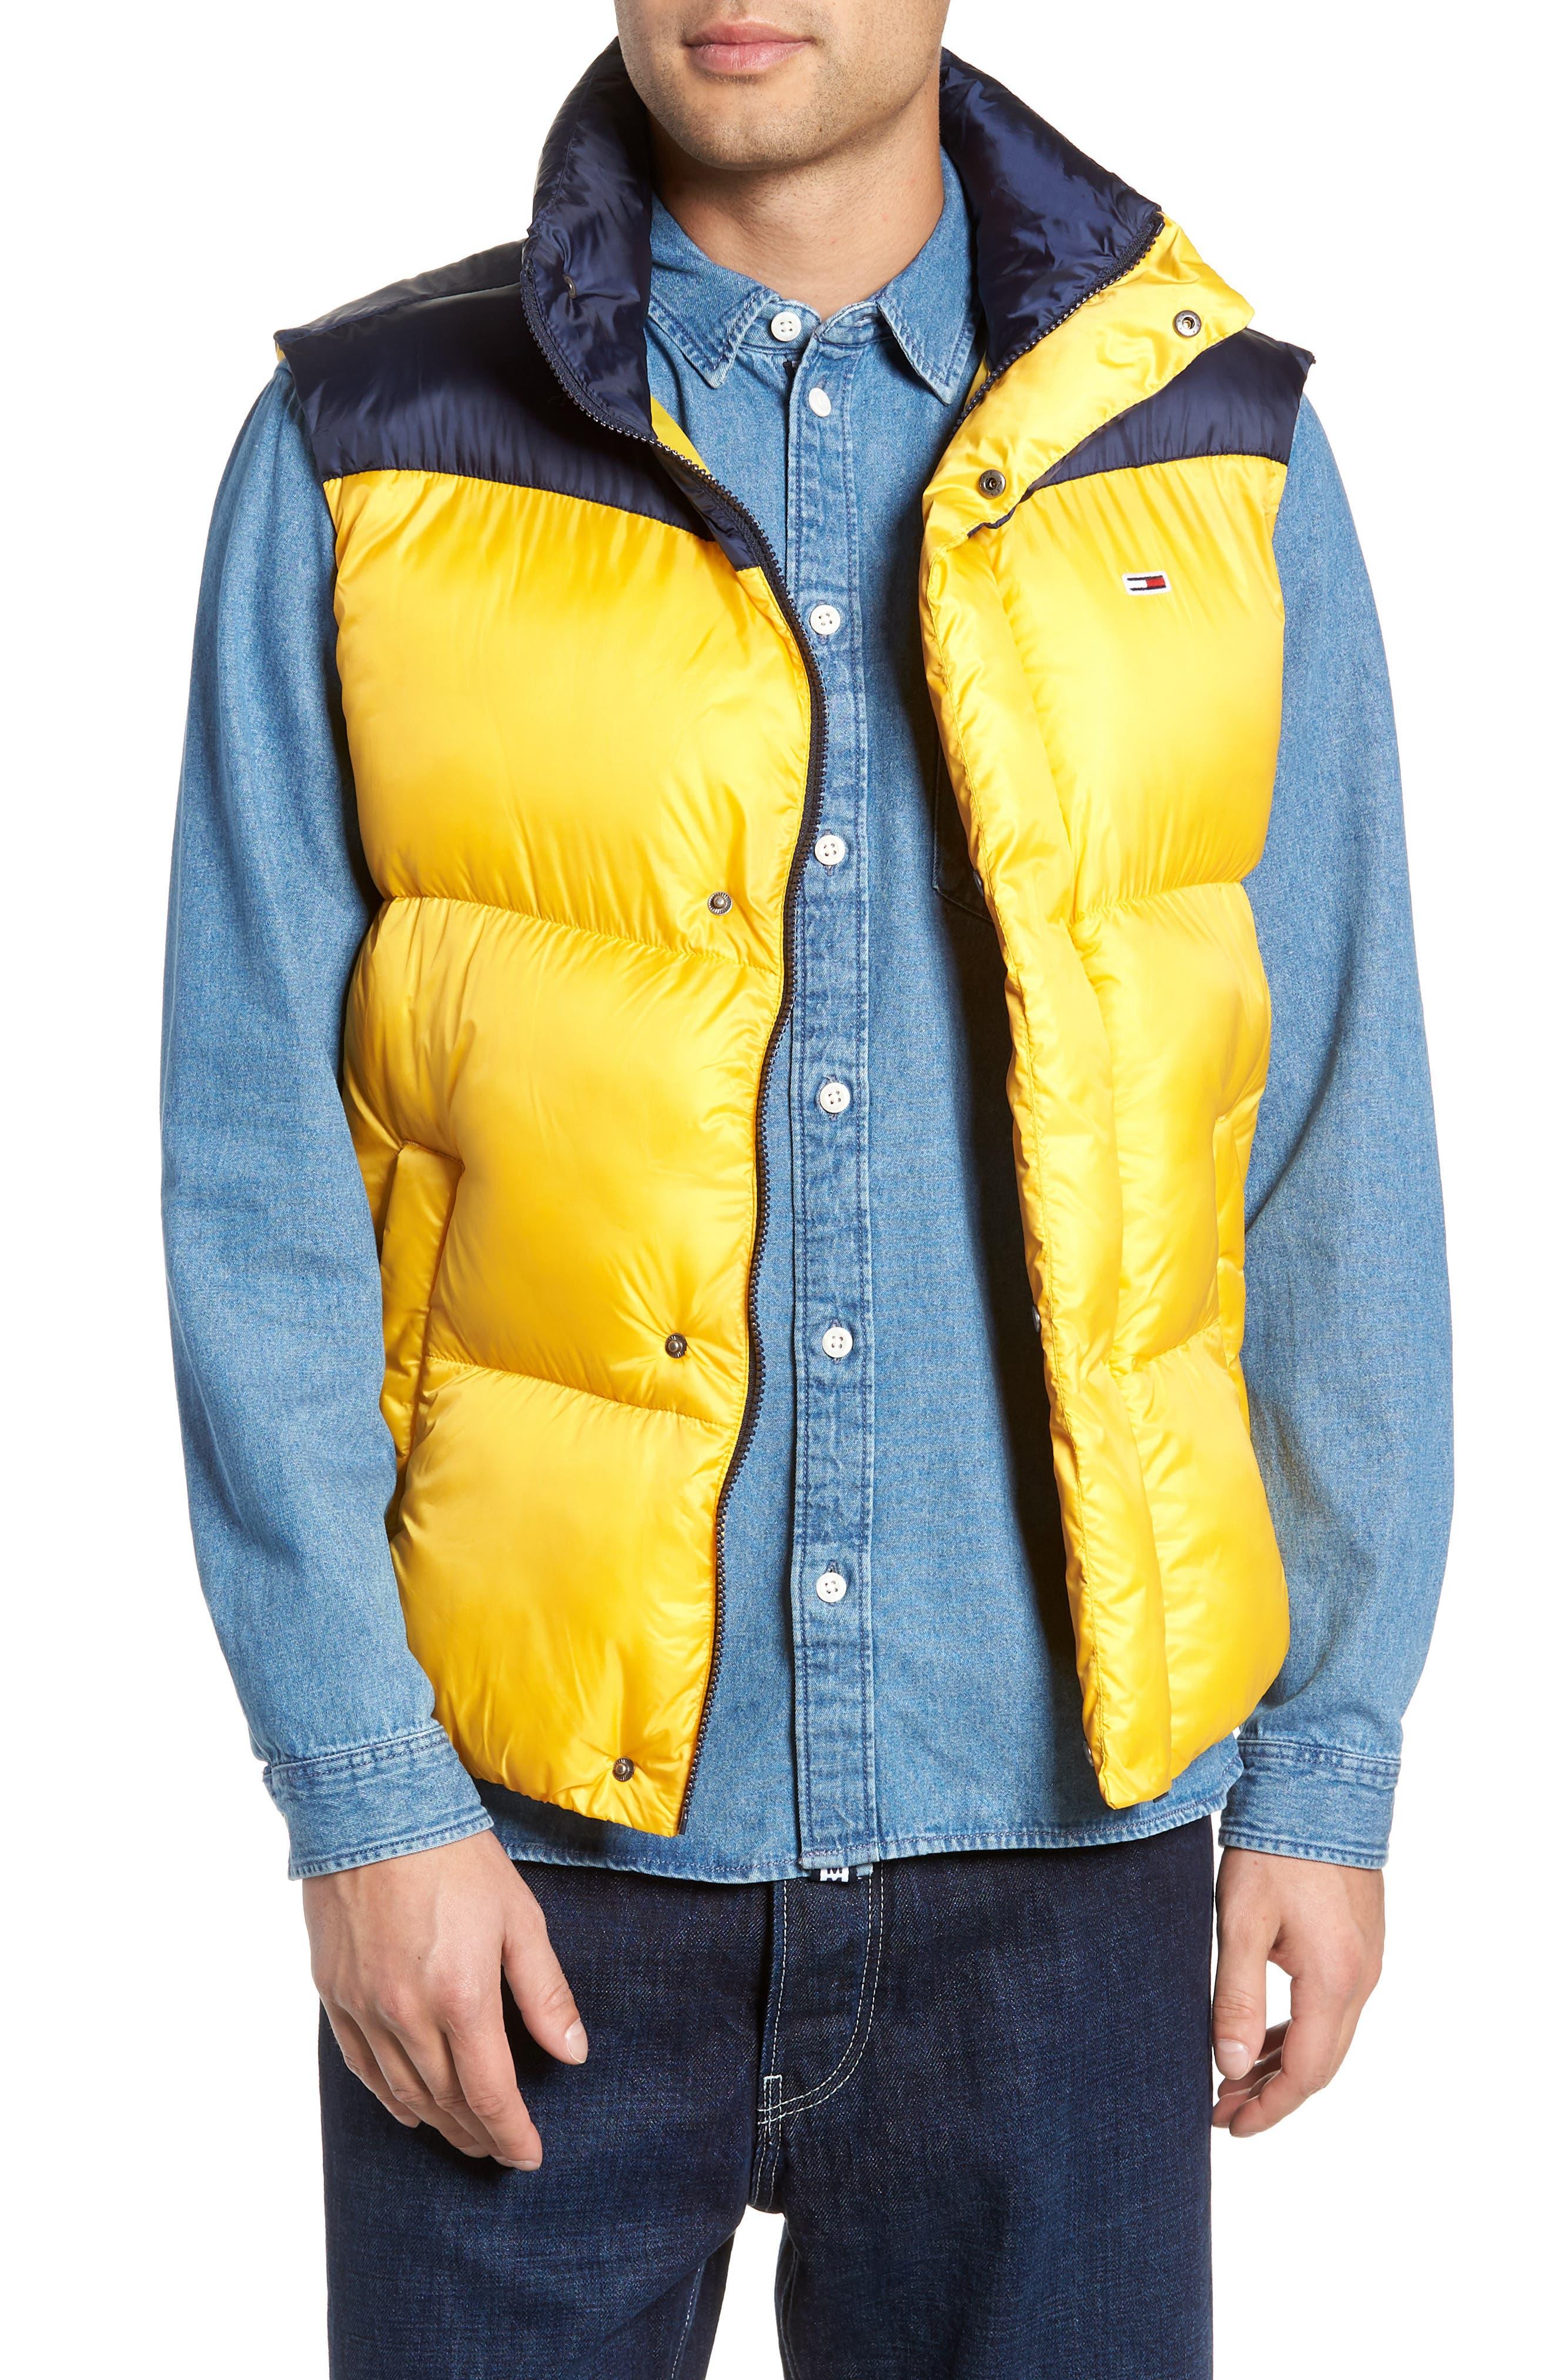 TJM Tommy Classics Vest,                             Main thumbnail 1, color,                             SPECTRA YELLOW / BLACK IRIS